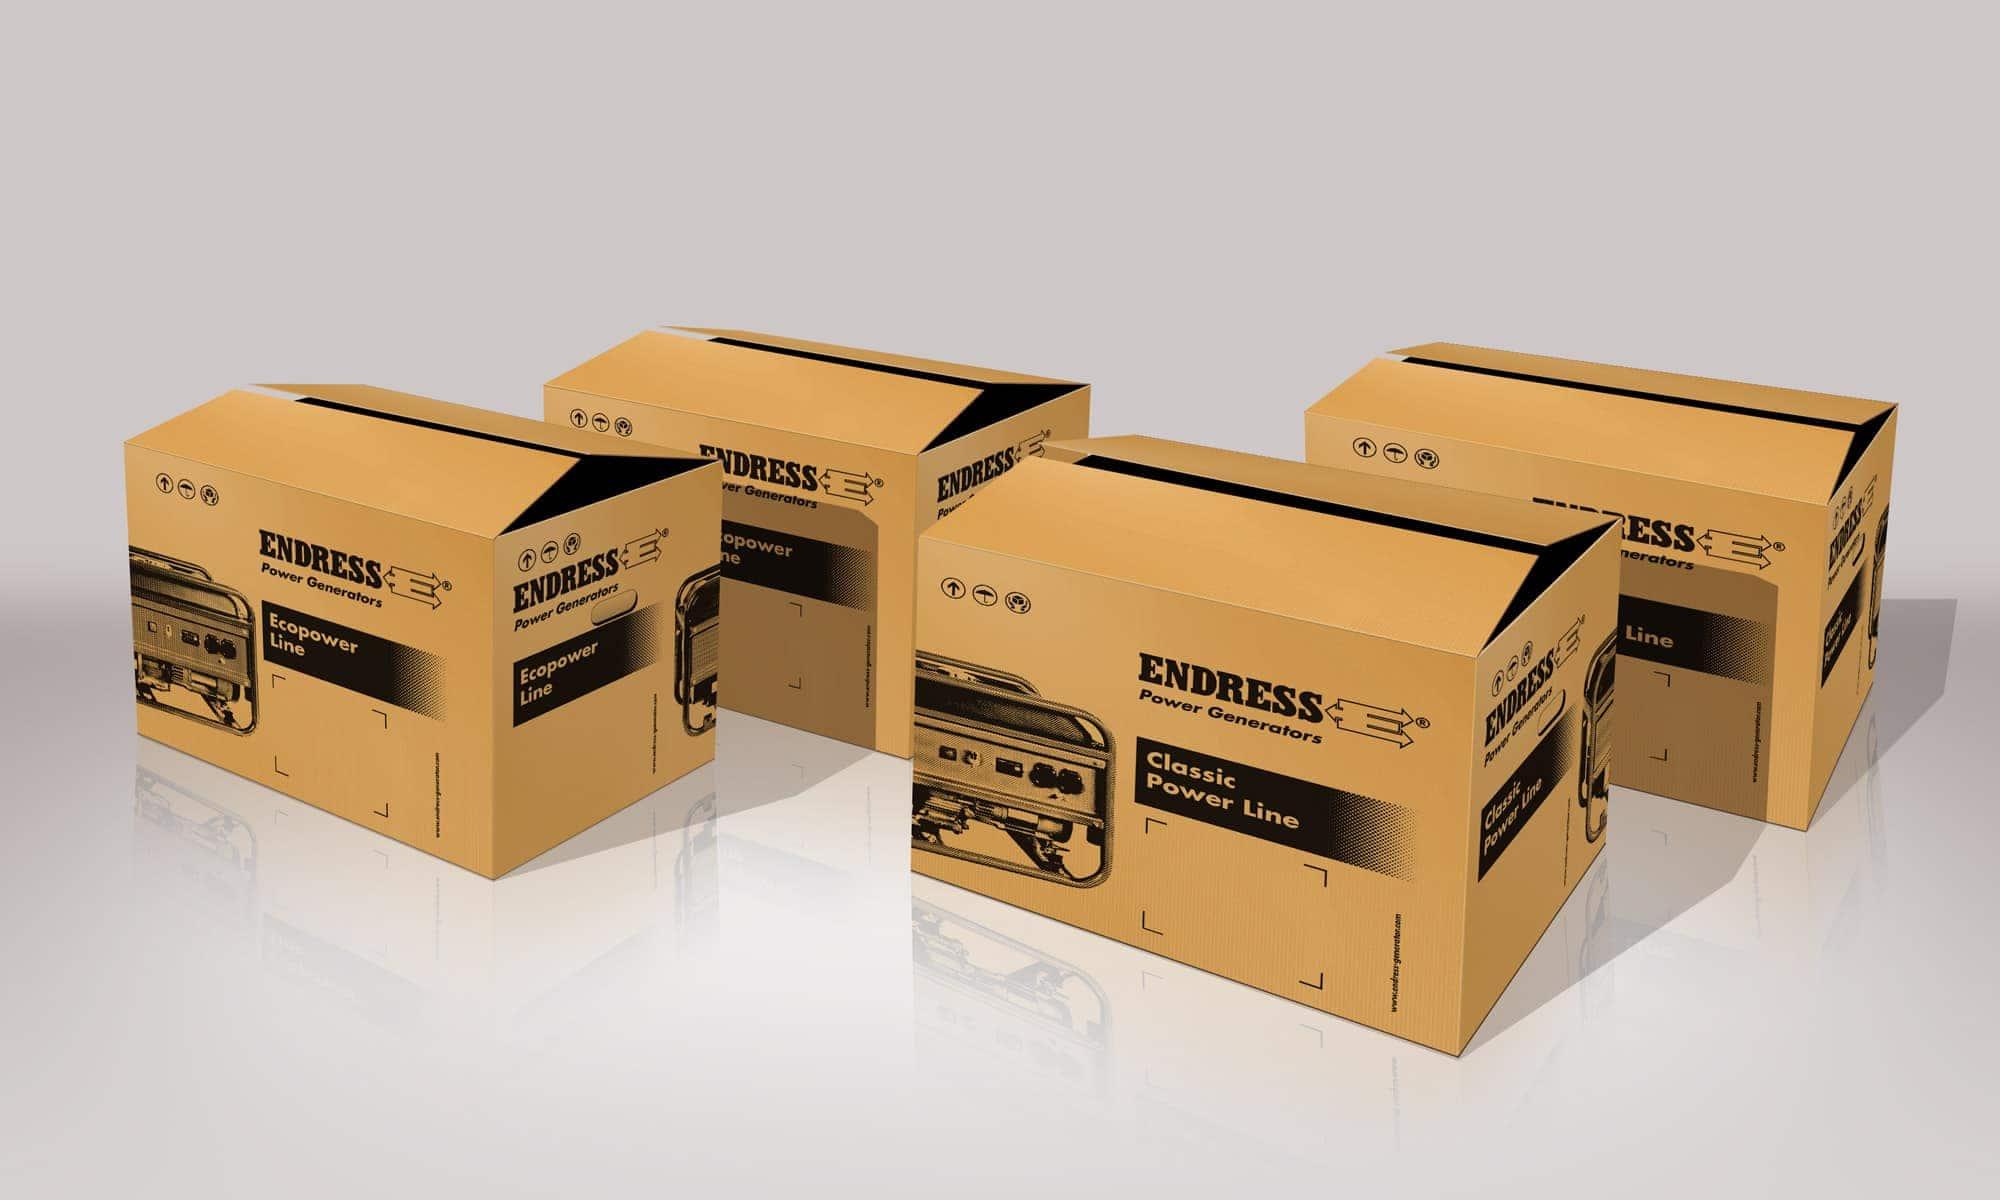 Endress – Verpackungen Eco und Classic Power Line